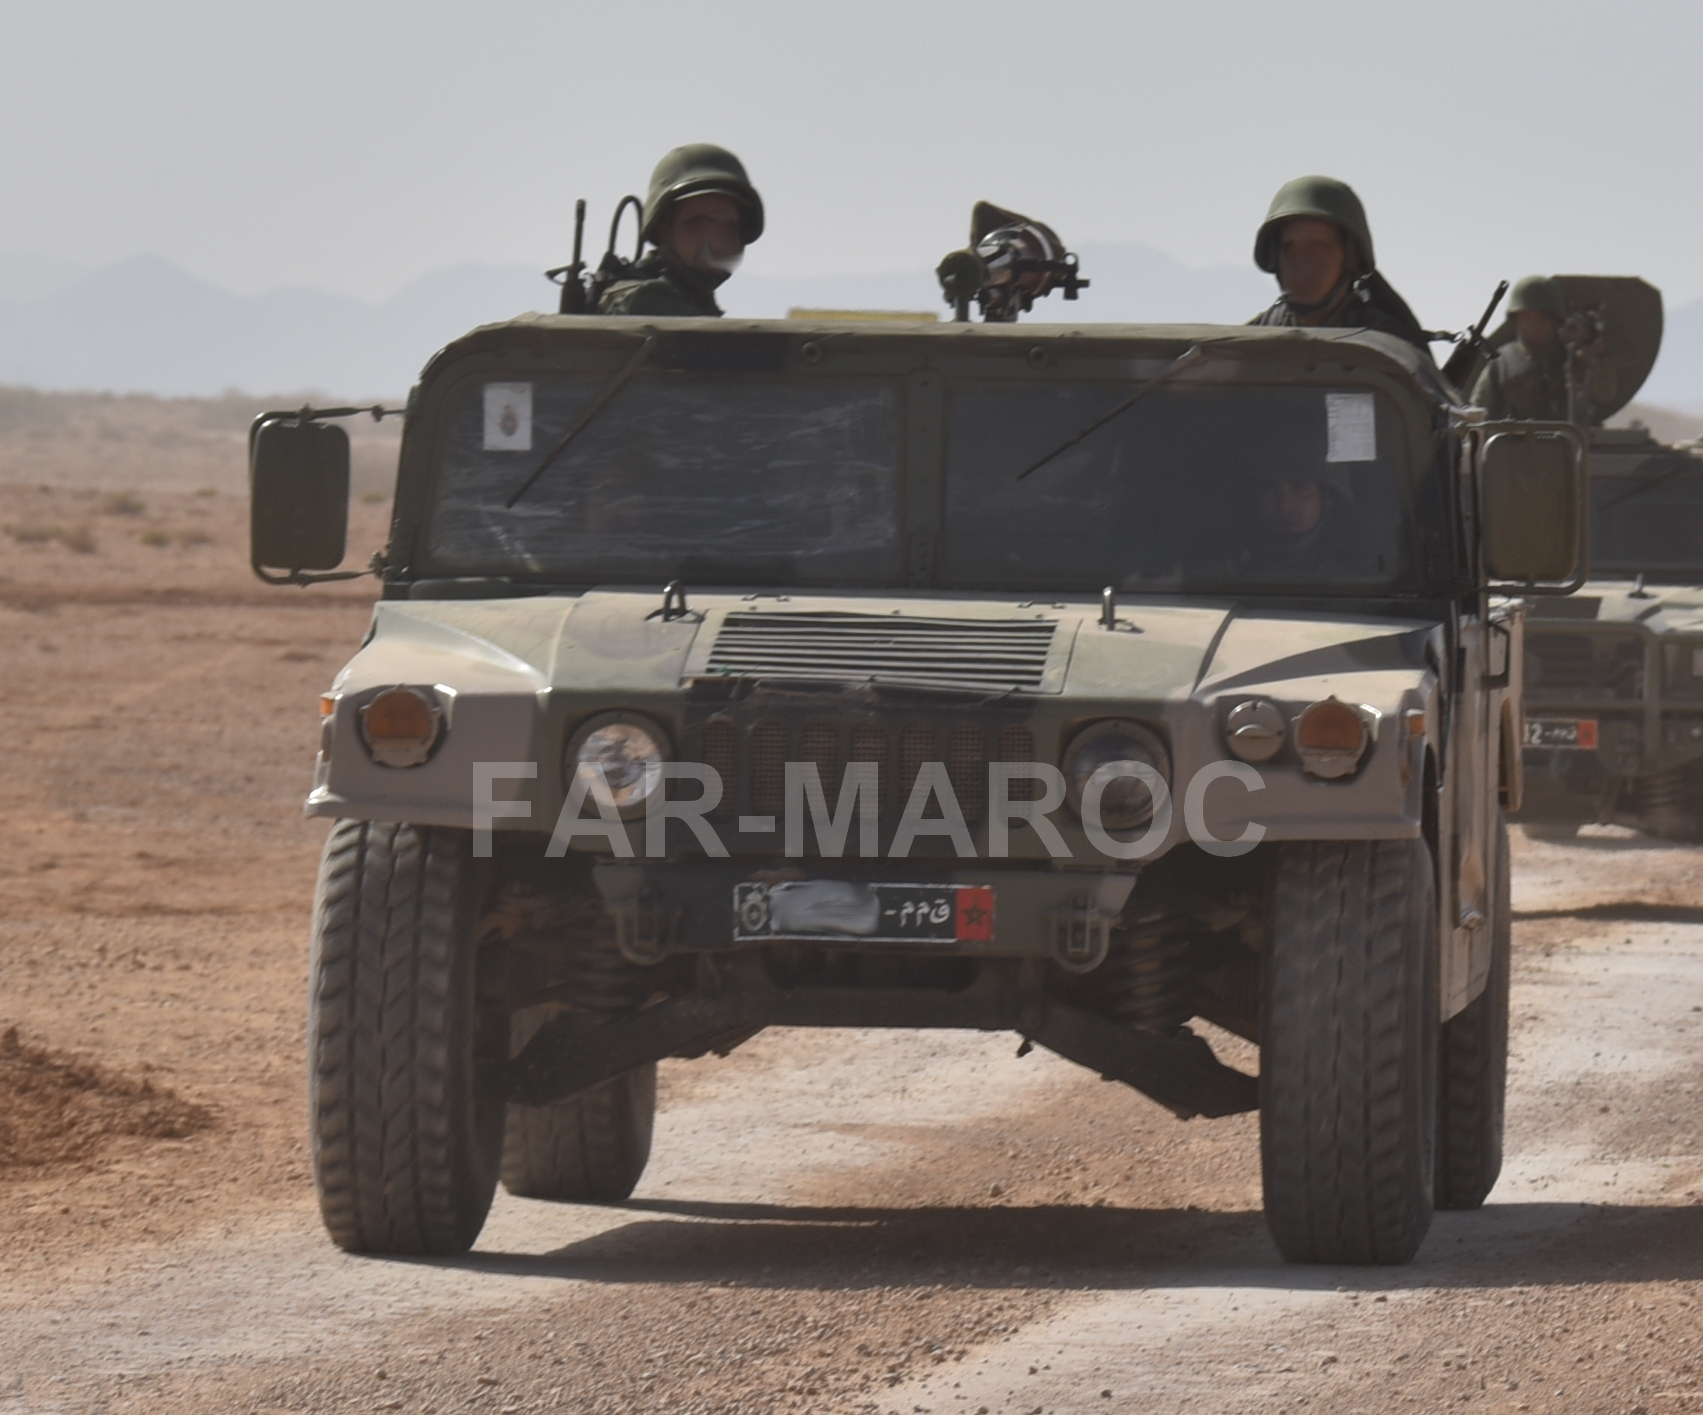 HMMWV et HMMWV Marine Armor Kit (MAK)  - Page 5 49164428558_e465631caa_o